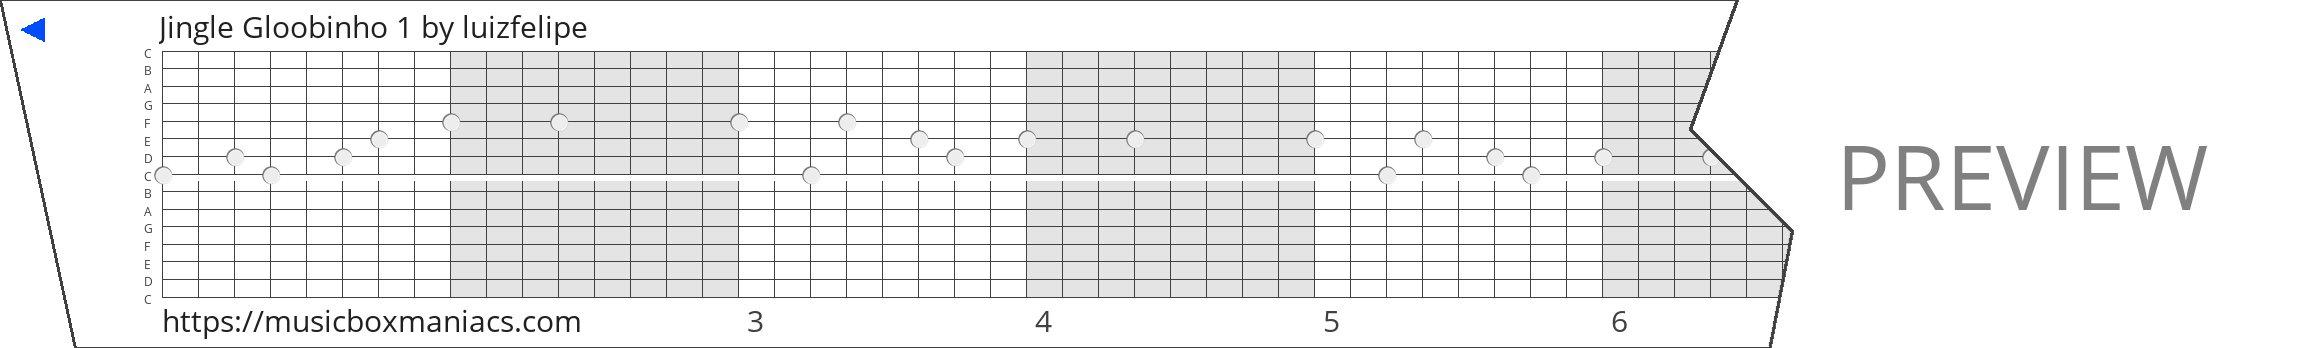 Jingle Gloobinho 1 15 note music box paper strip